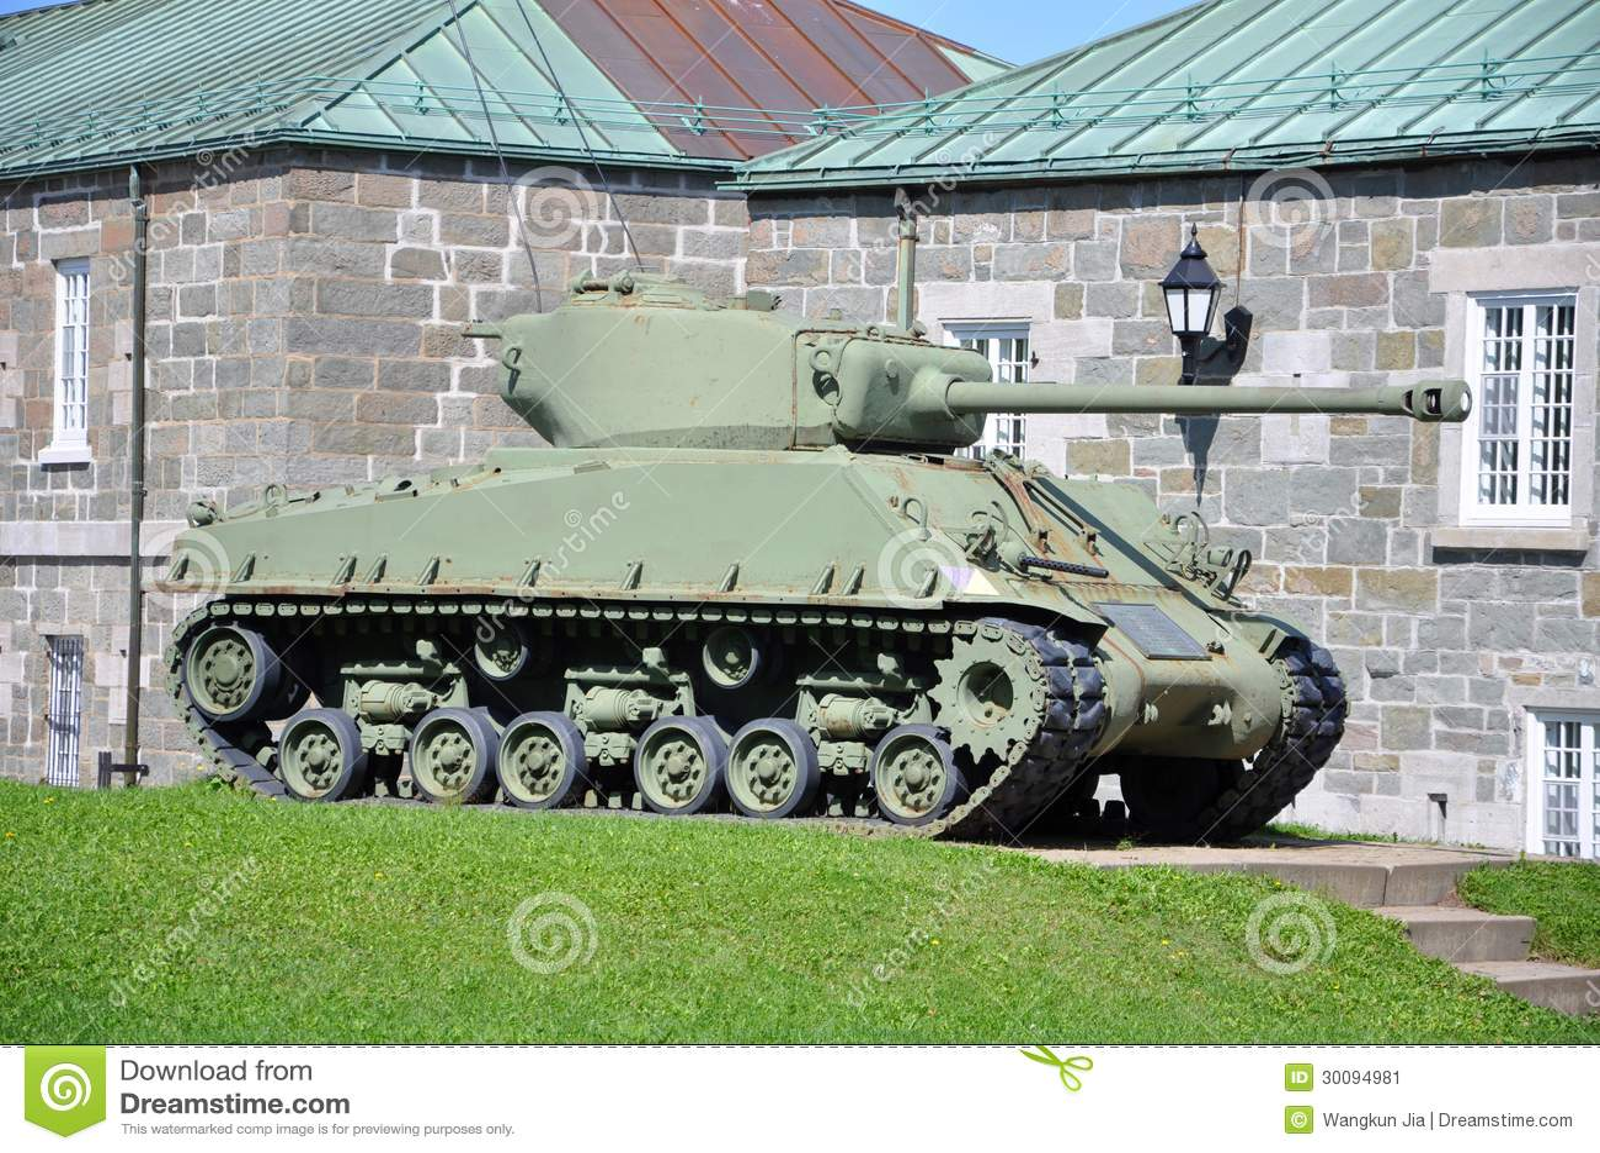 WWII Tank at La Citadelle in Quebec City, Canada